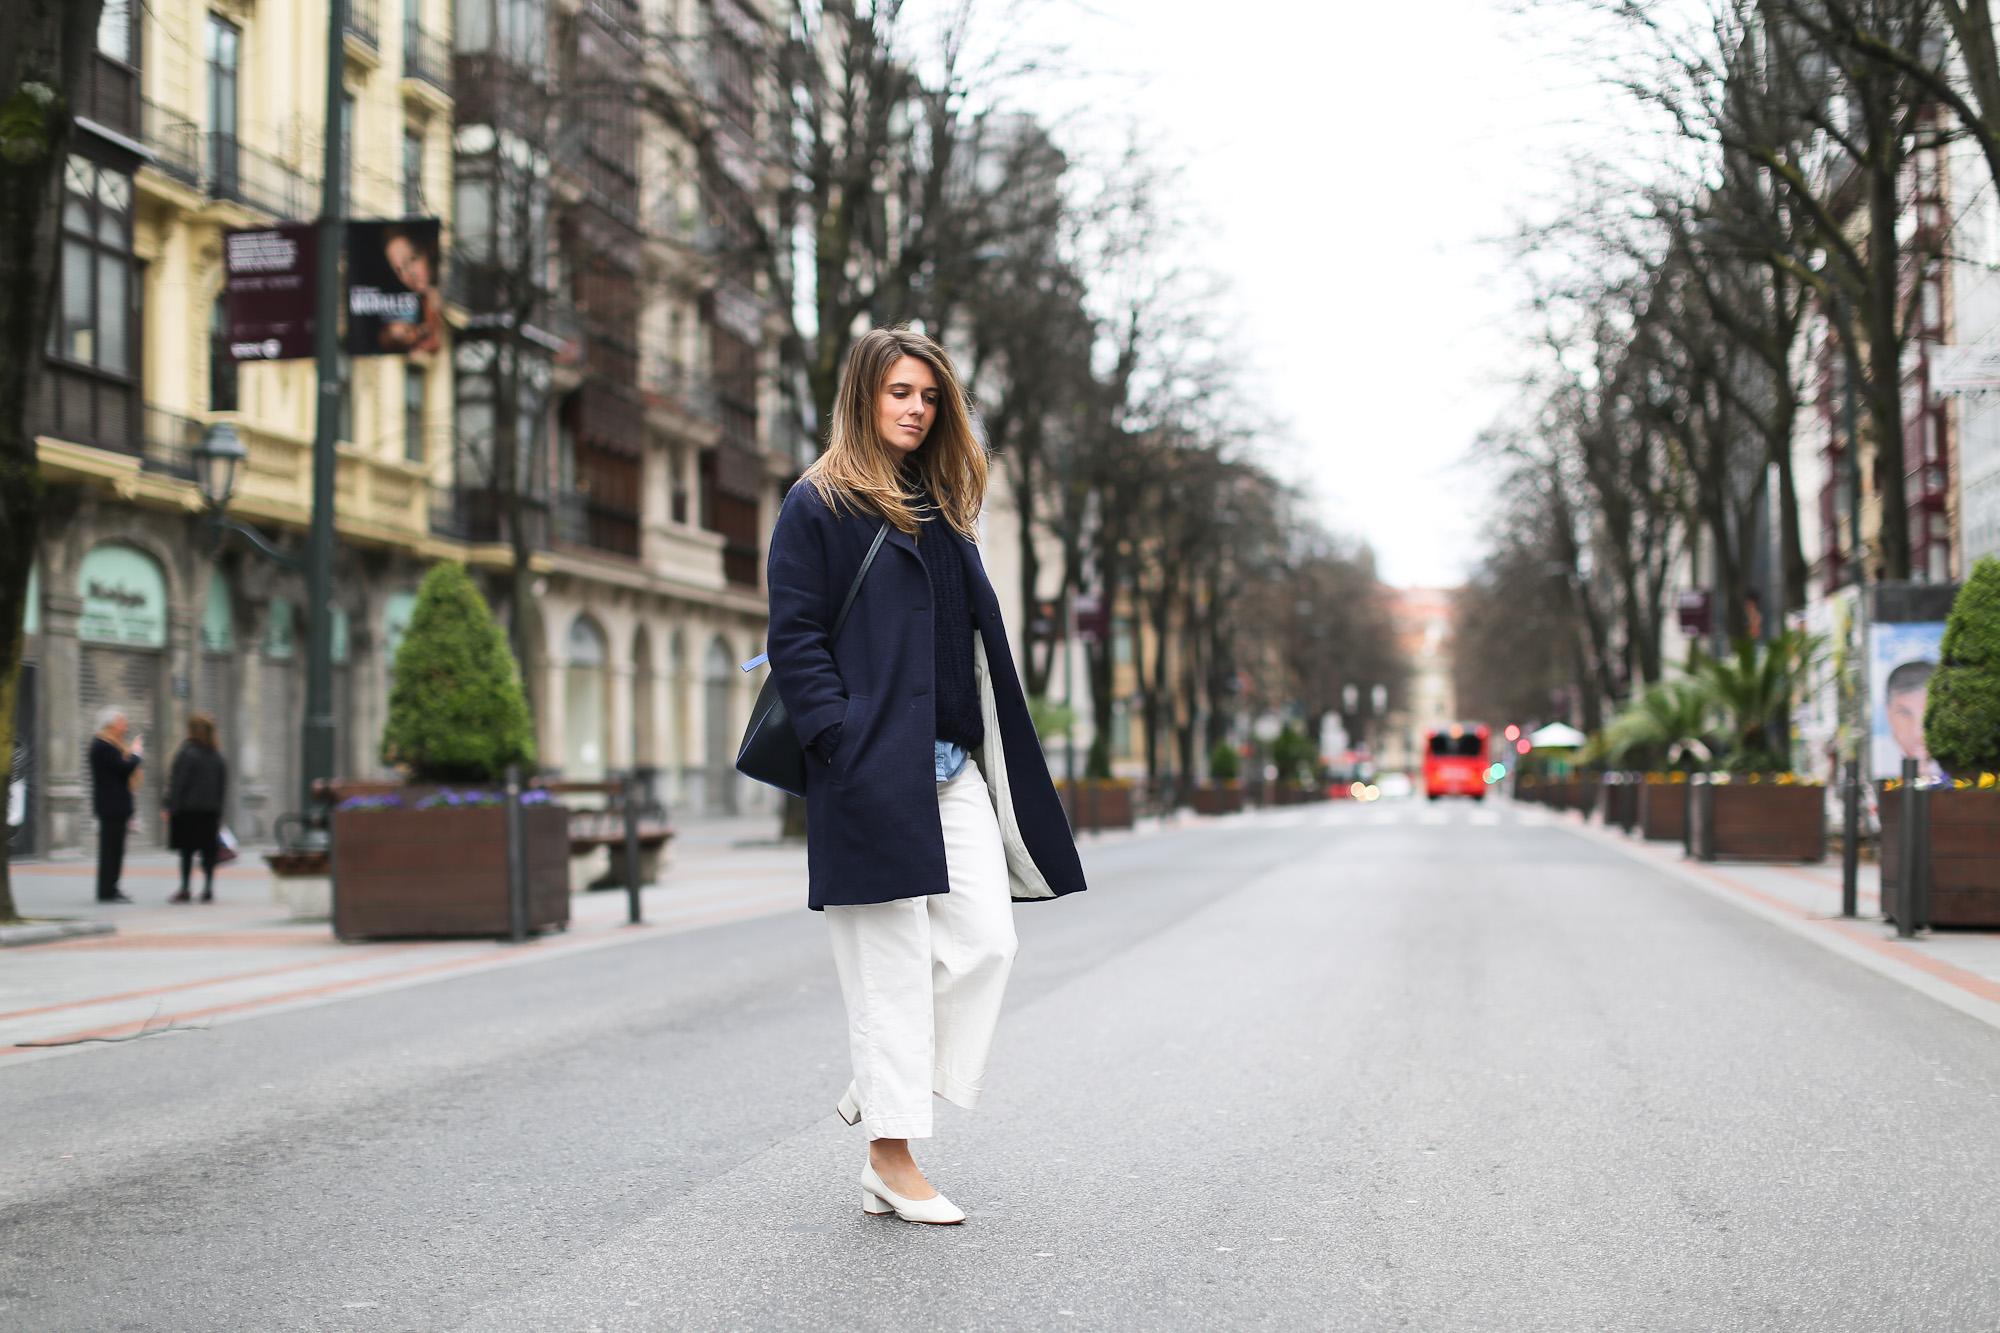 Clochet_streetstyle_masscob_coulson_coat_trimmerbilbao_granny_shoes_white_culottes-2